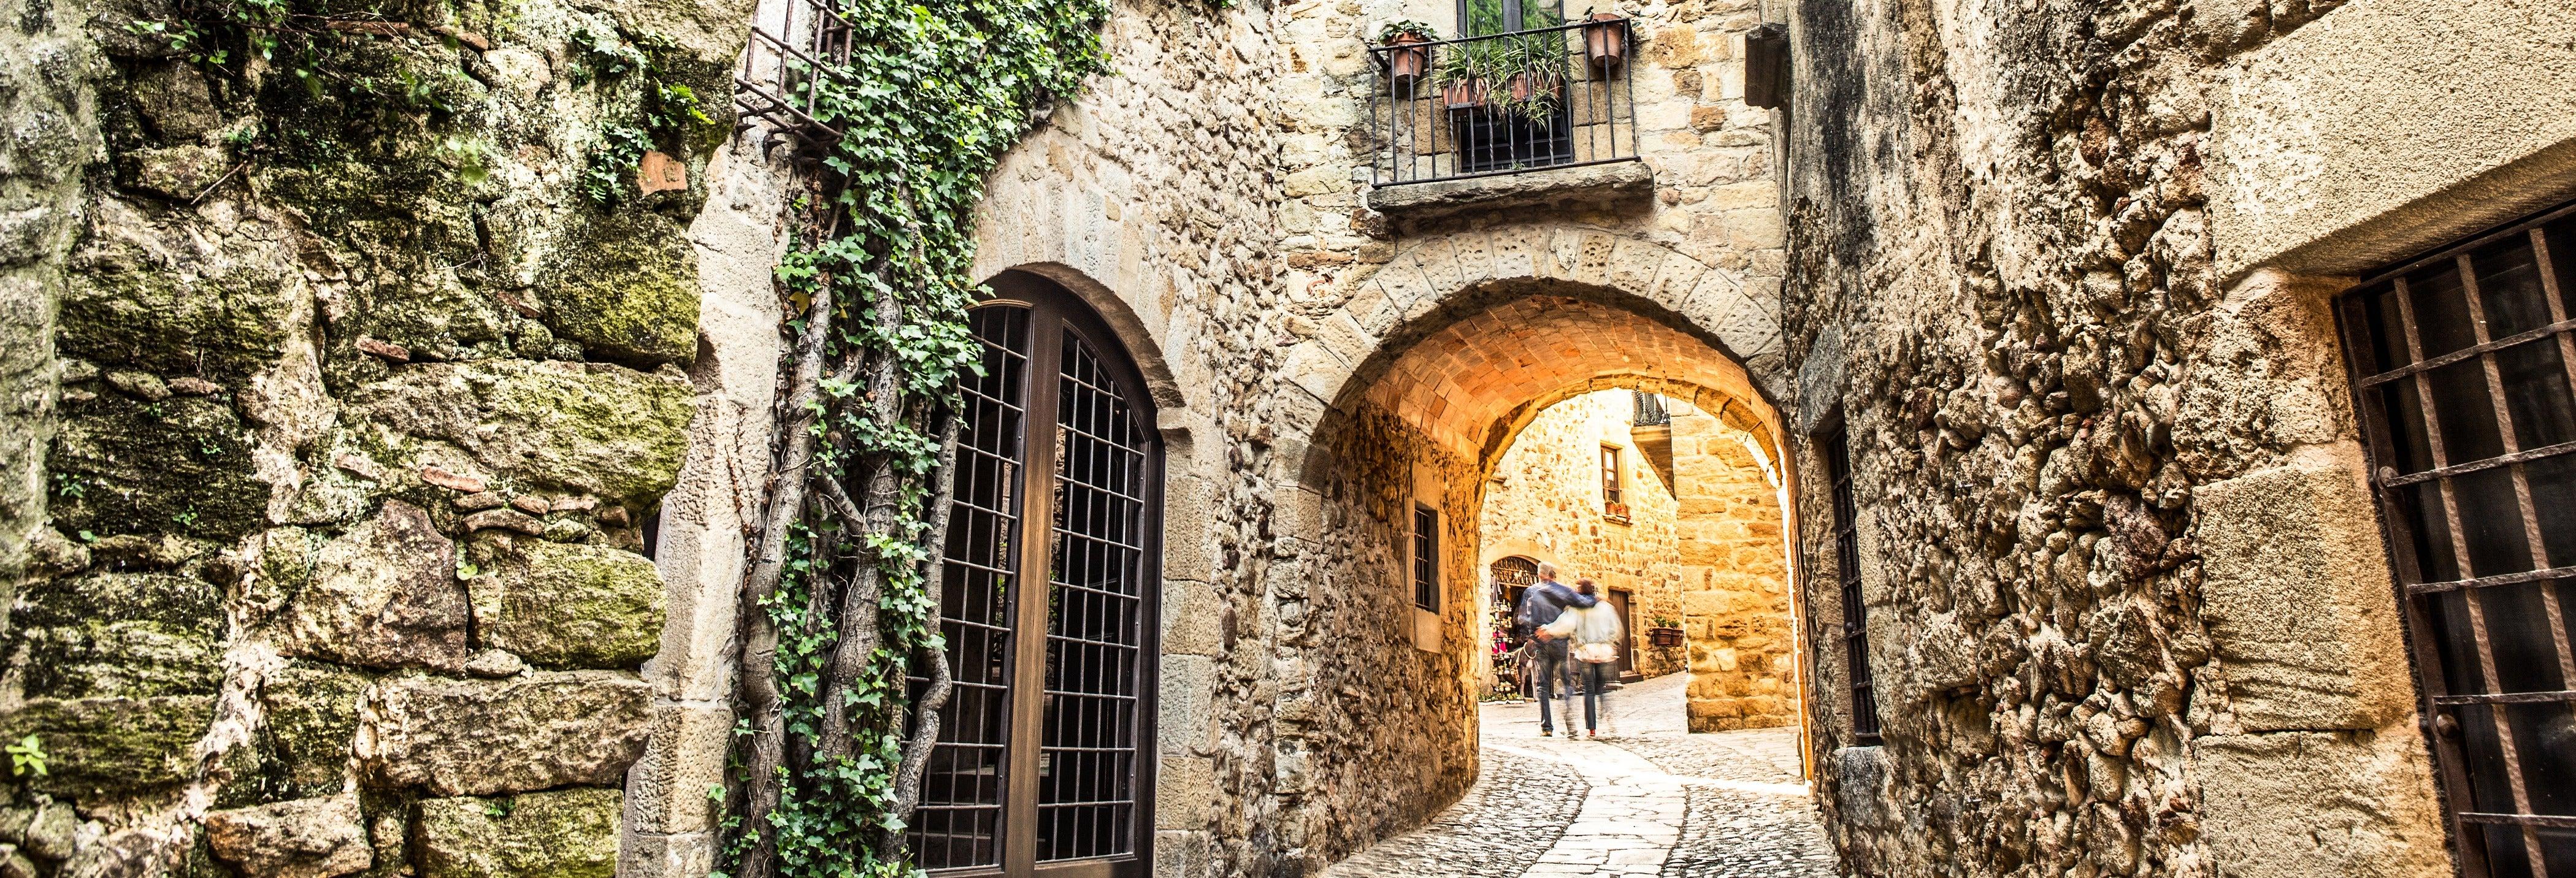 Girona Day Trip & Wine Tasting